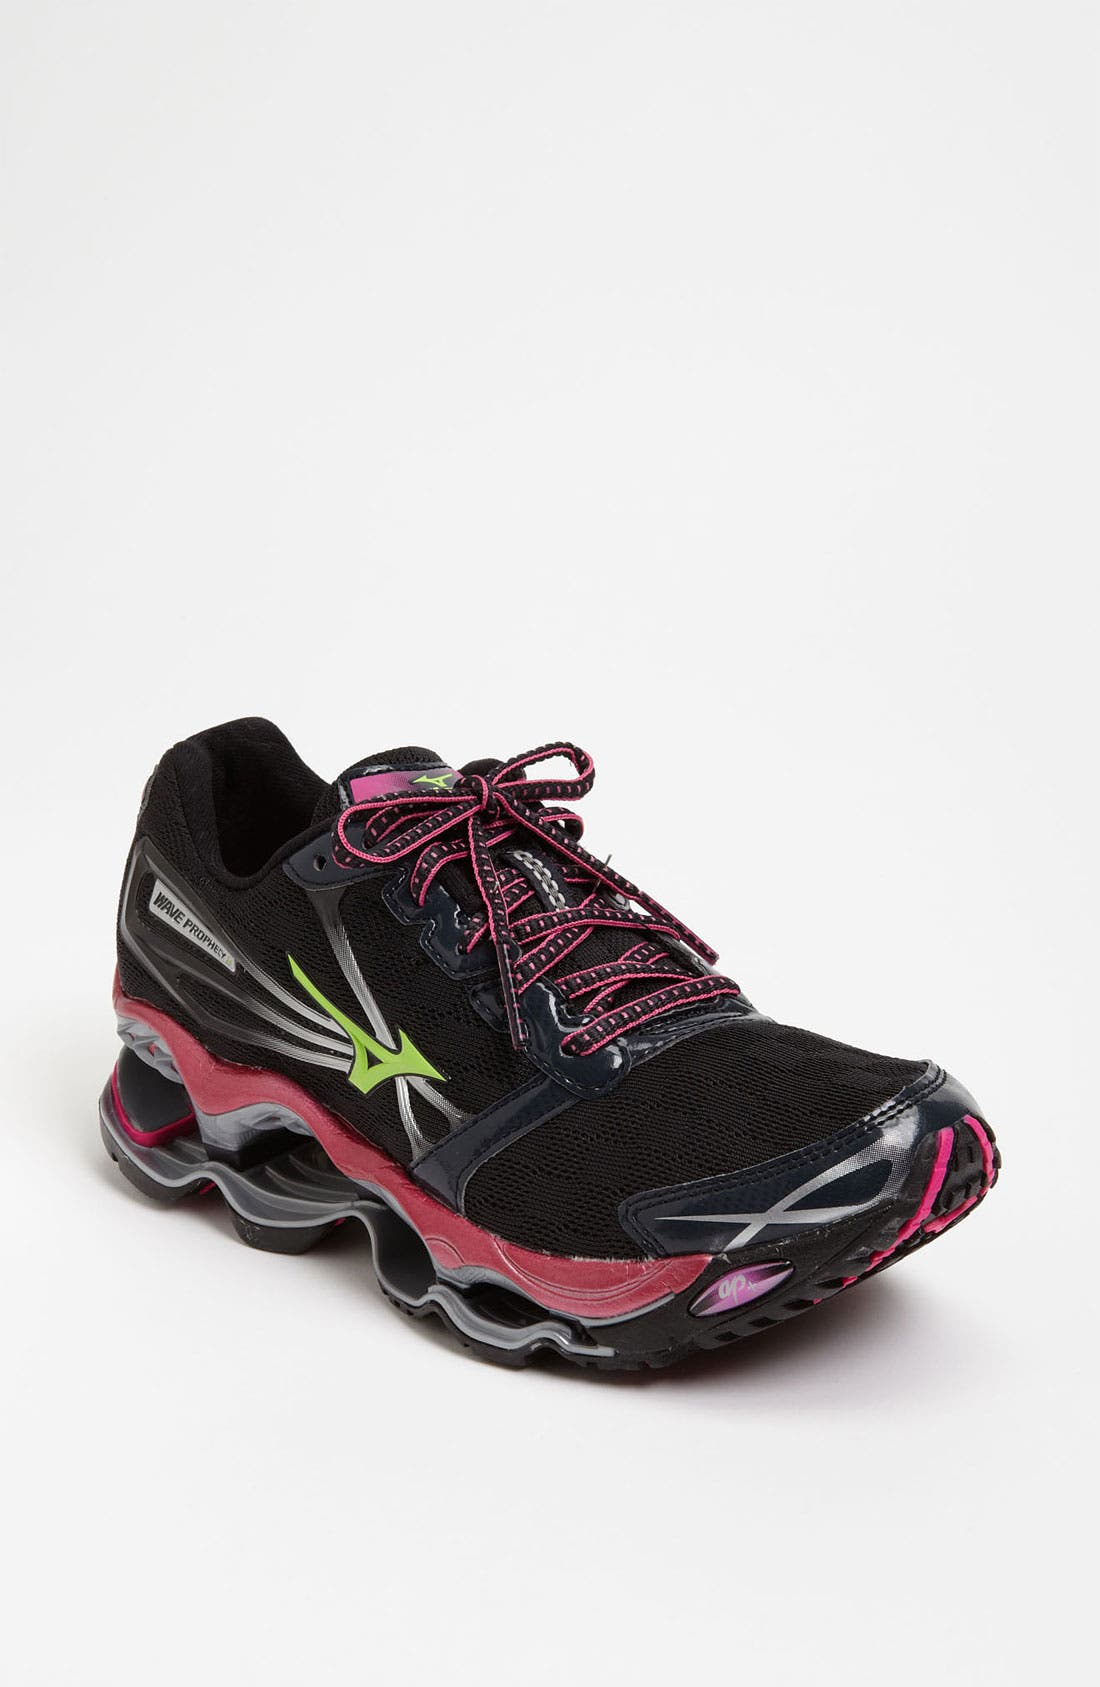 Alternate Image 1 Selected - Mizuno 'Wave Prophecy 2' Running Shoe (Women)